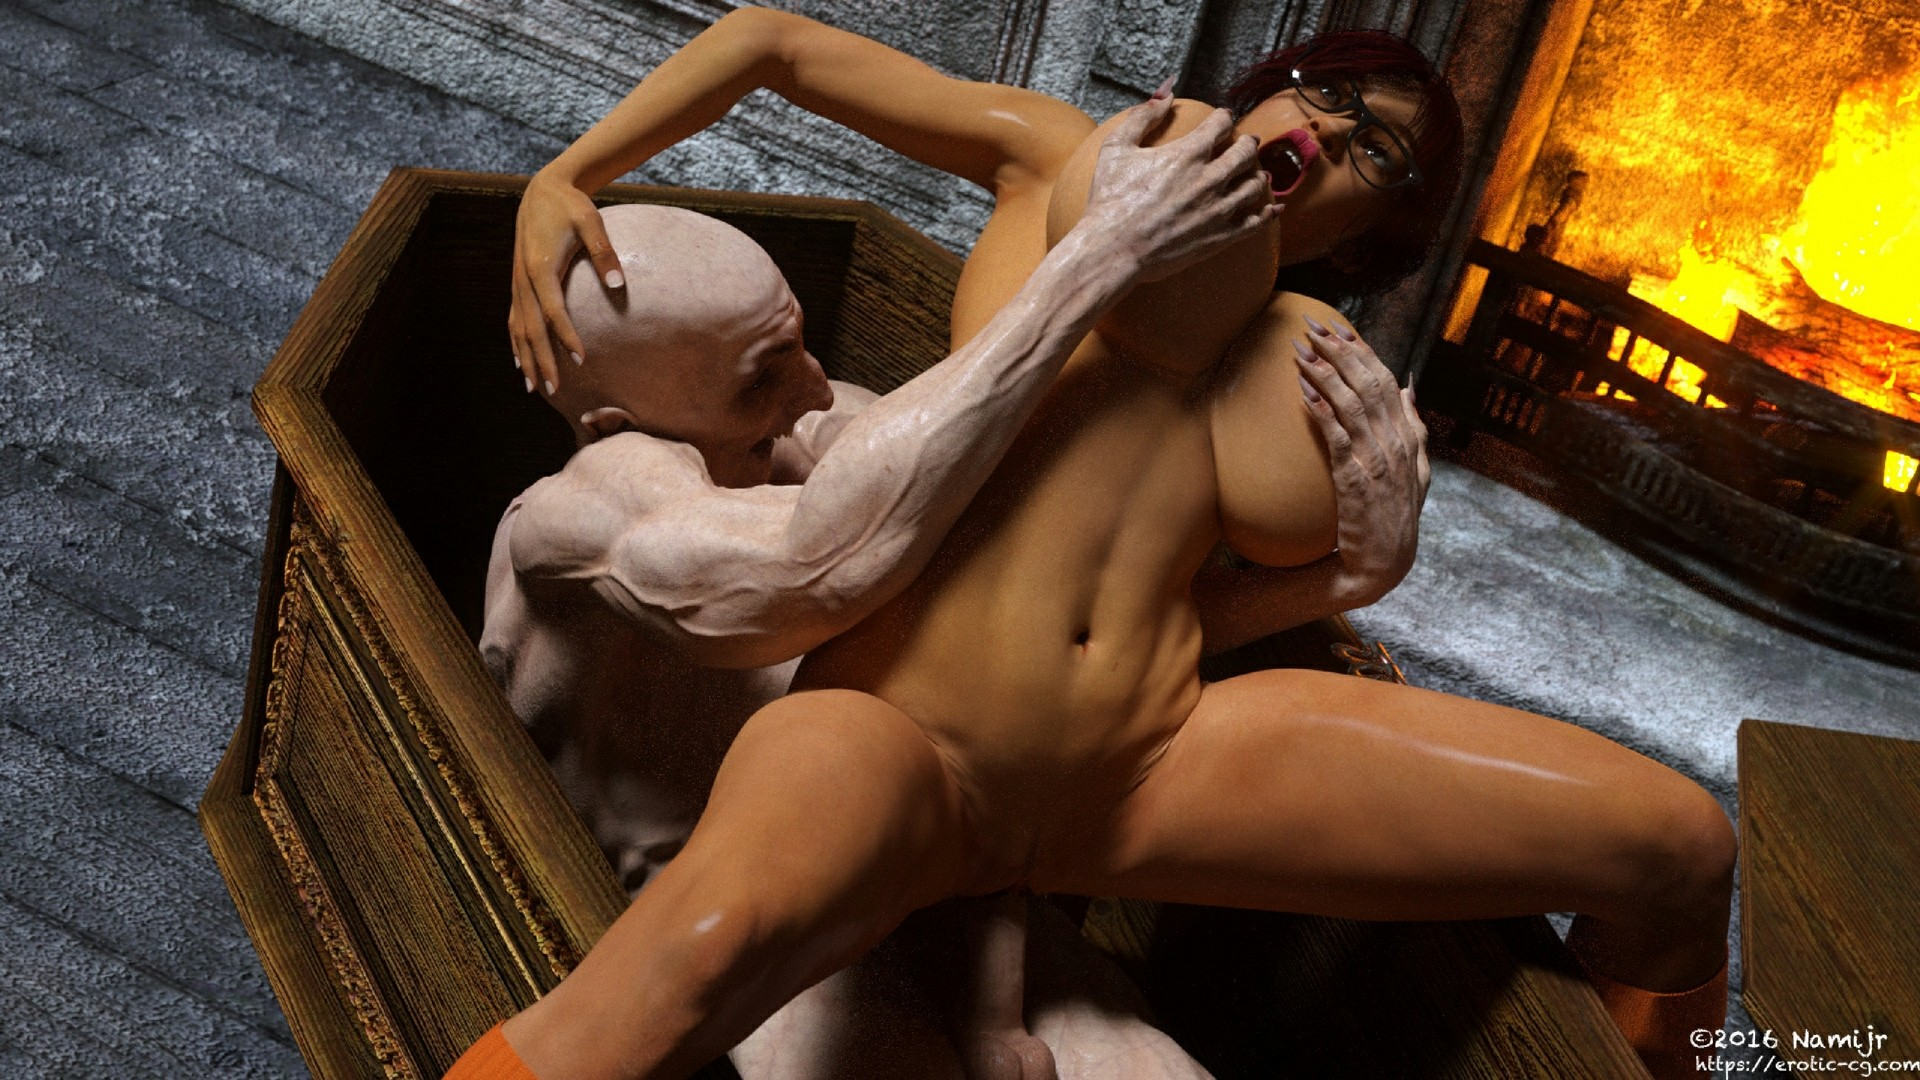 vampire-hard-sex-torrent-iggy-penetration